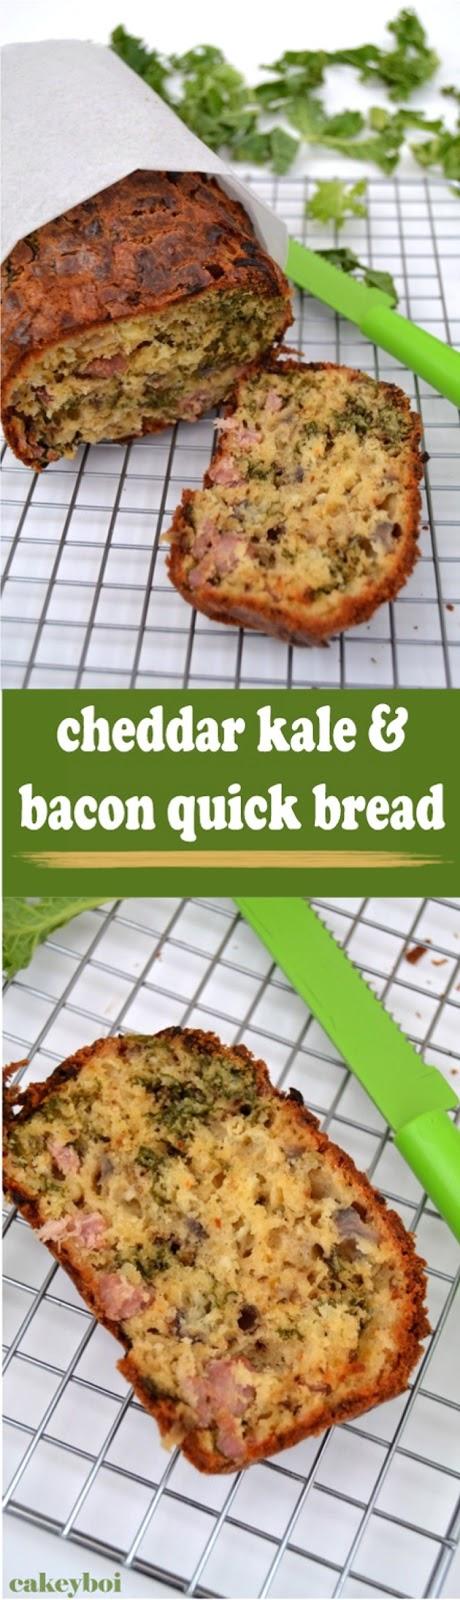 Cakeyboi: Cheddar Kale and Bacon Quick Bread